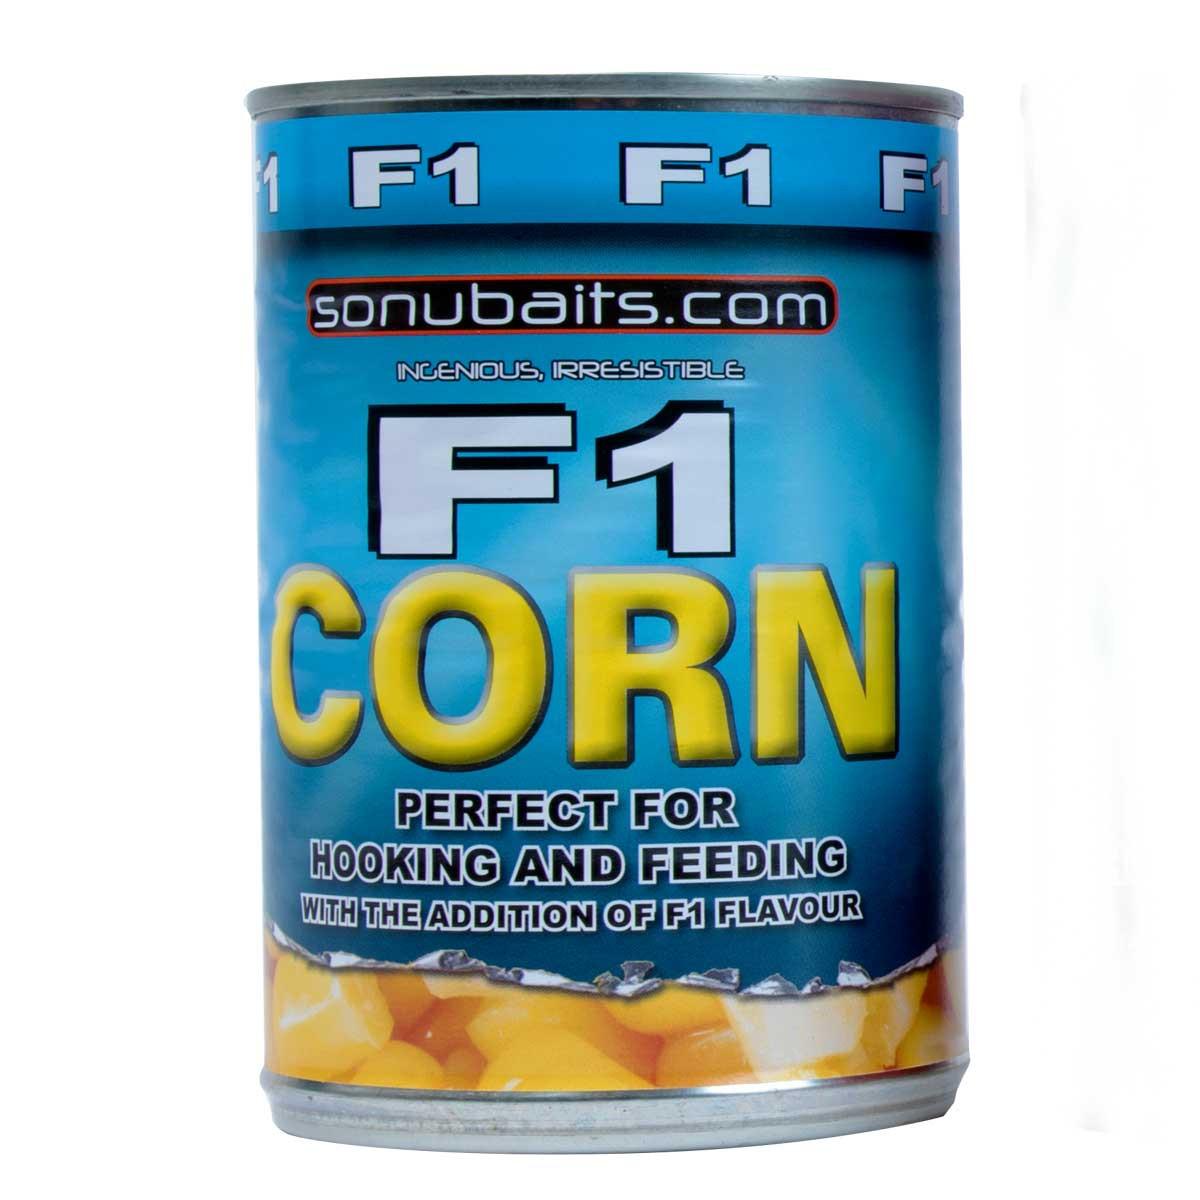 SST/CORNF1 Sonubaits F1 Corn